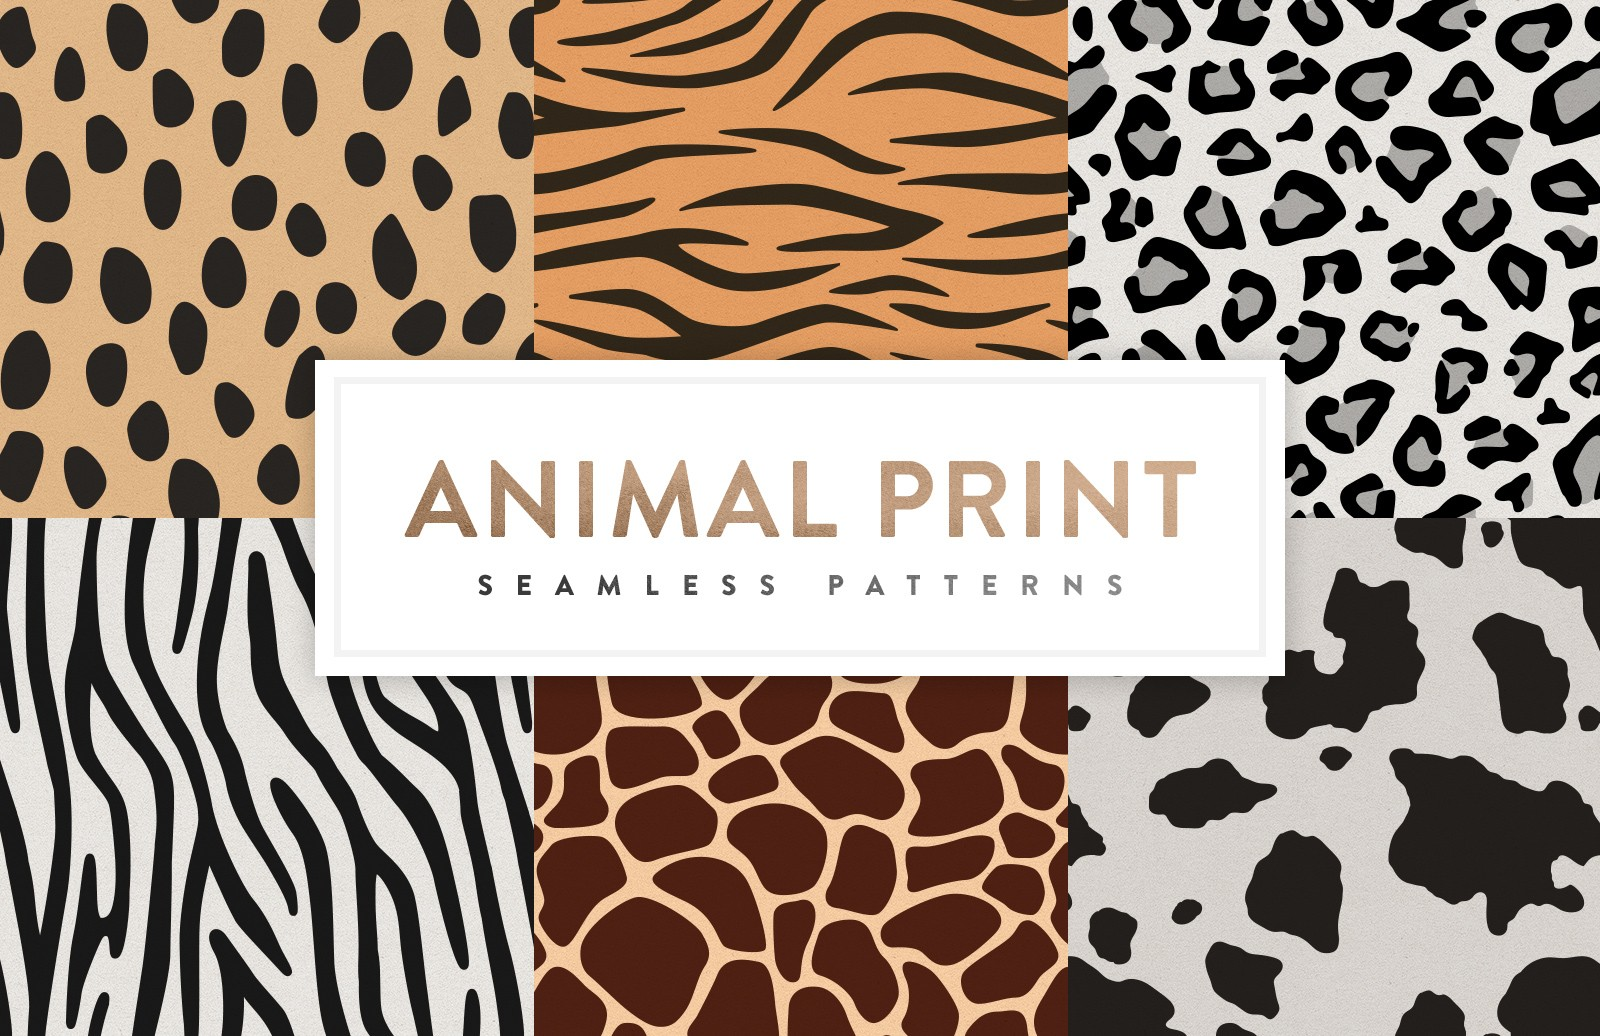 Seamless Animal Print Patterns